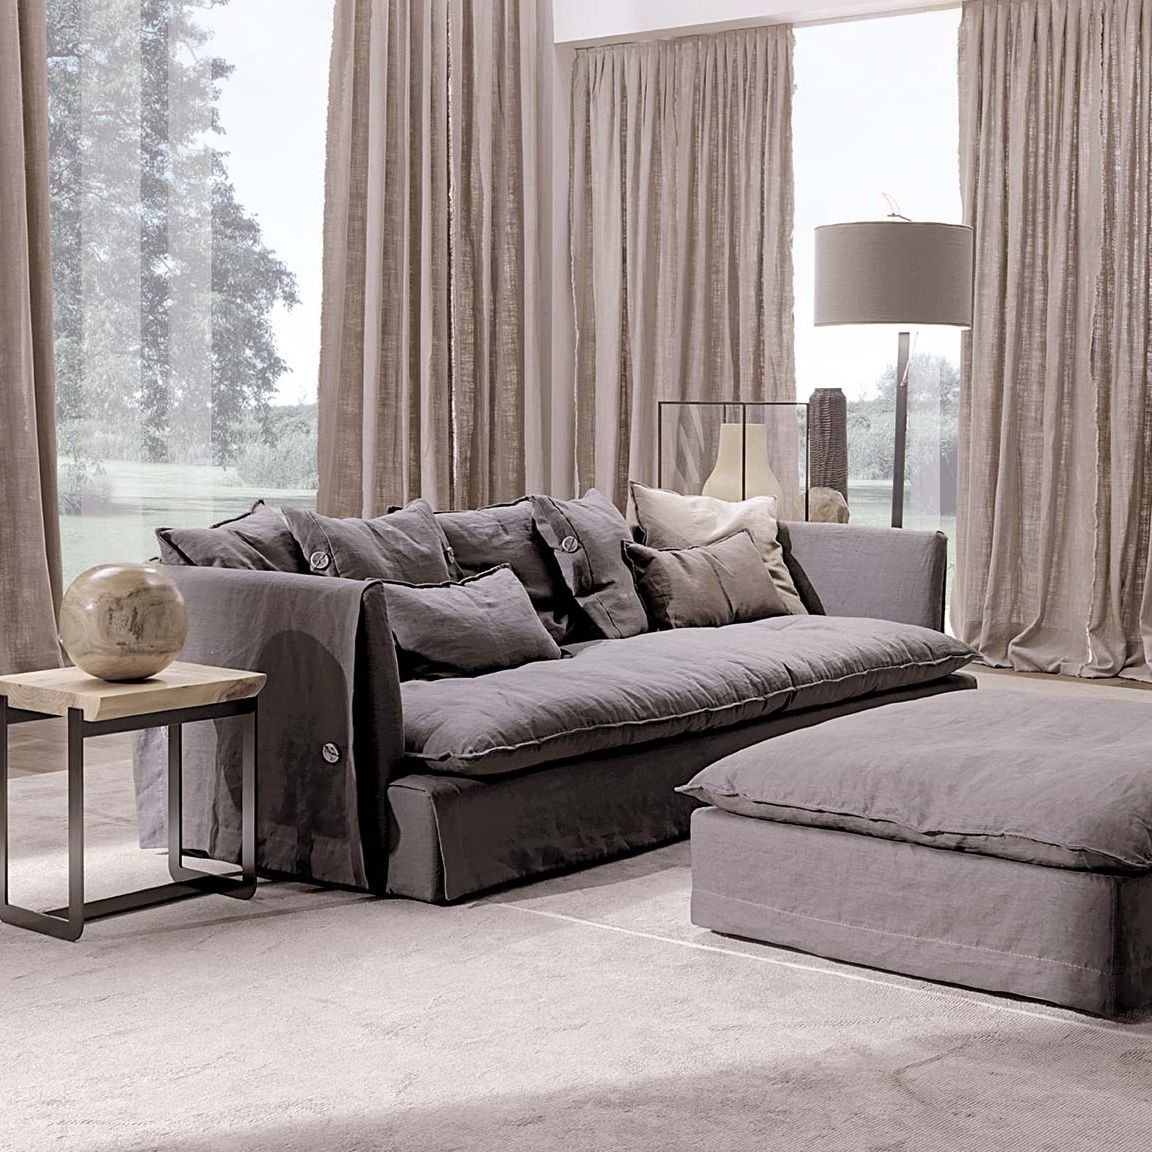 Sofa modern stoff  Kompaktes Sofa / modern / Stoff / Leder - KIMONO JUNIOR - Frigerio ...